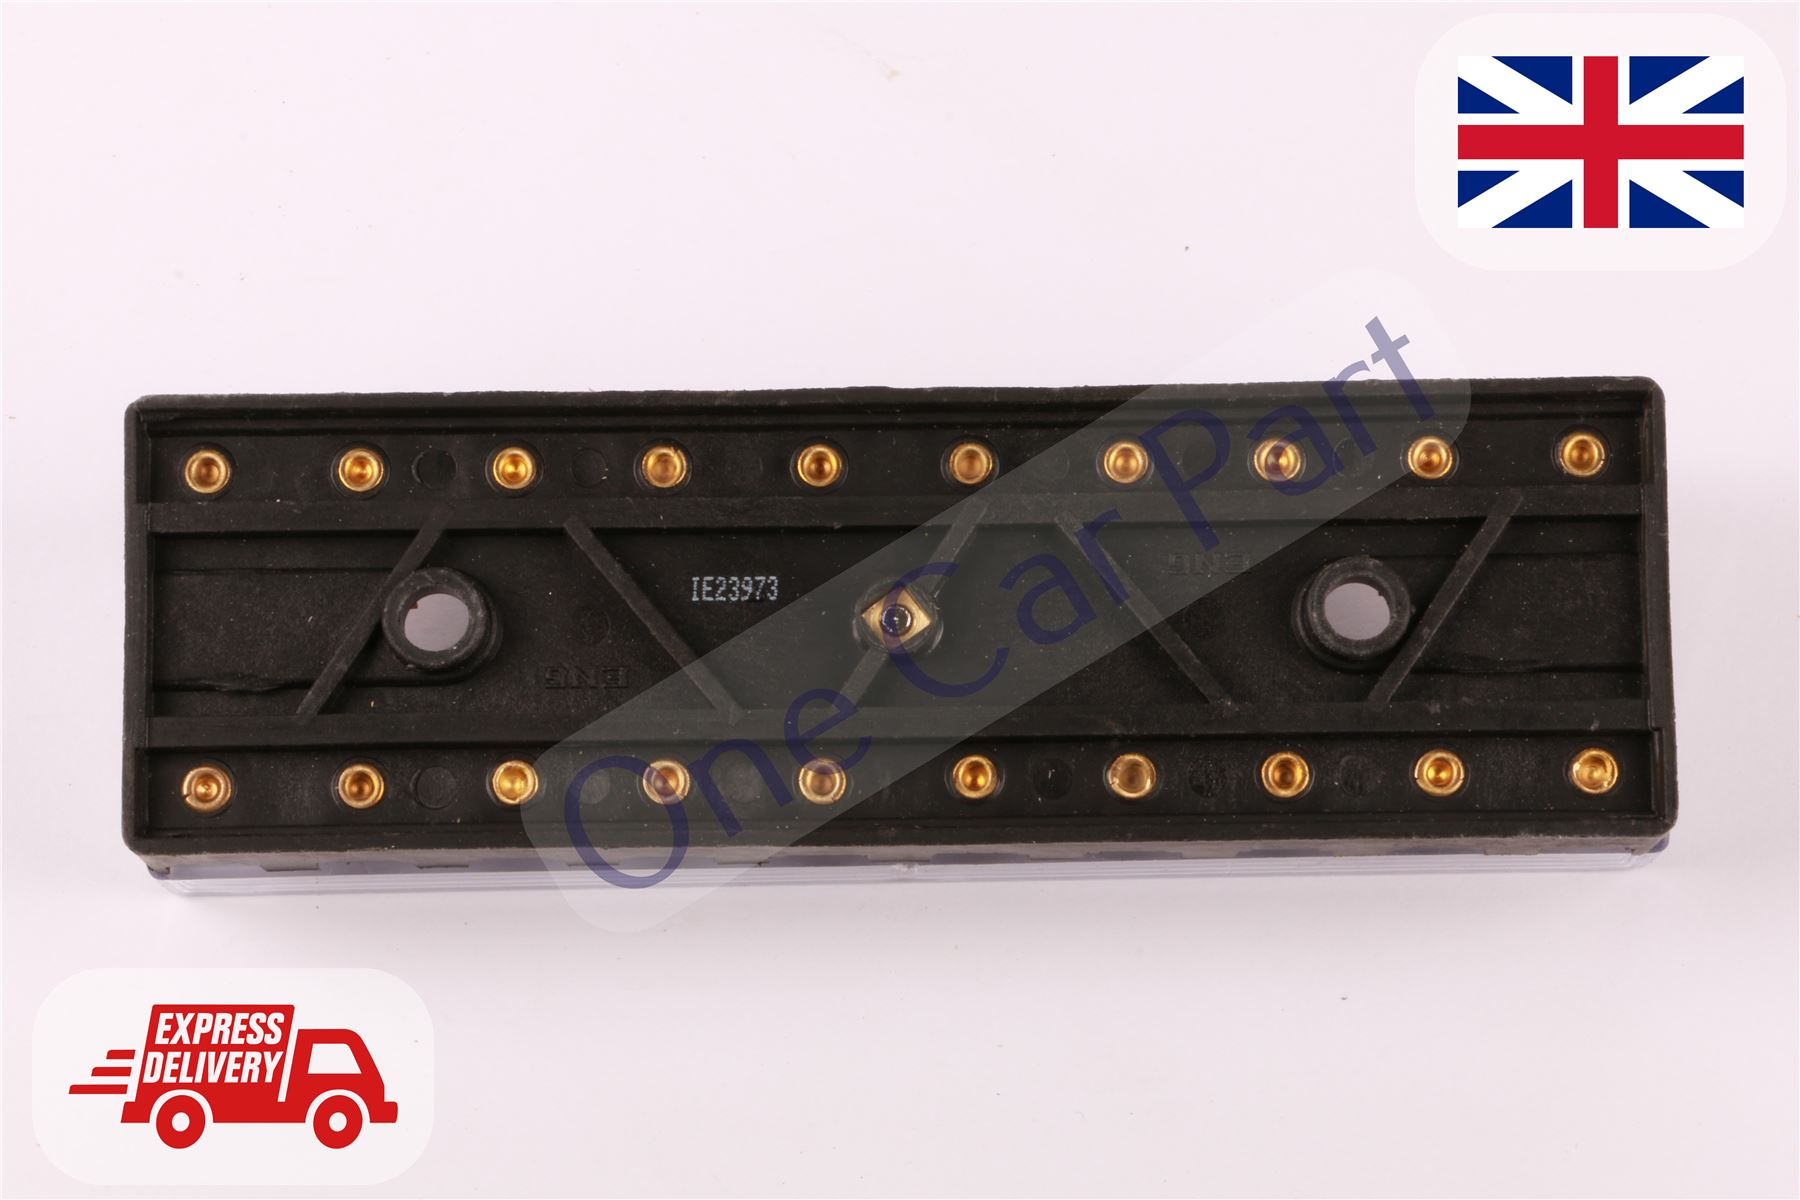 10 WAY CERAMIC TORPEDO CONTINENTAL FUSE BOX HOLDER CLASSIC CAR 6V 12V 24V  VOLT